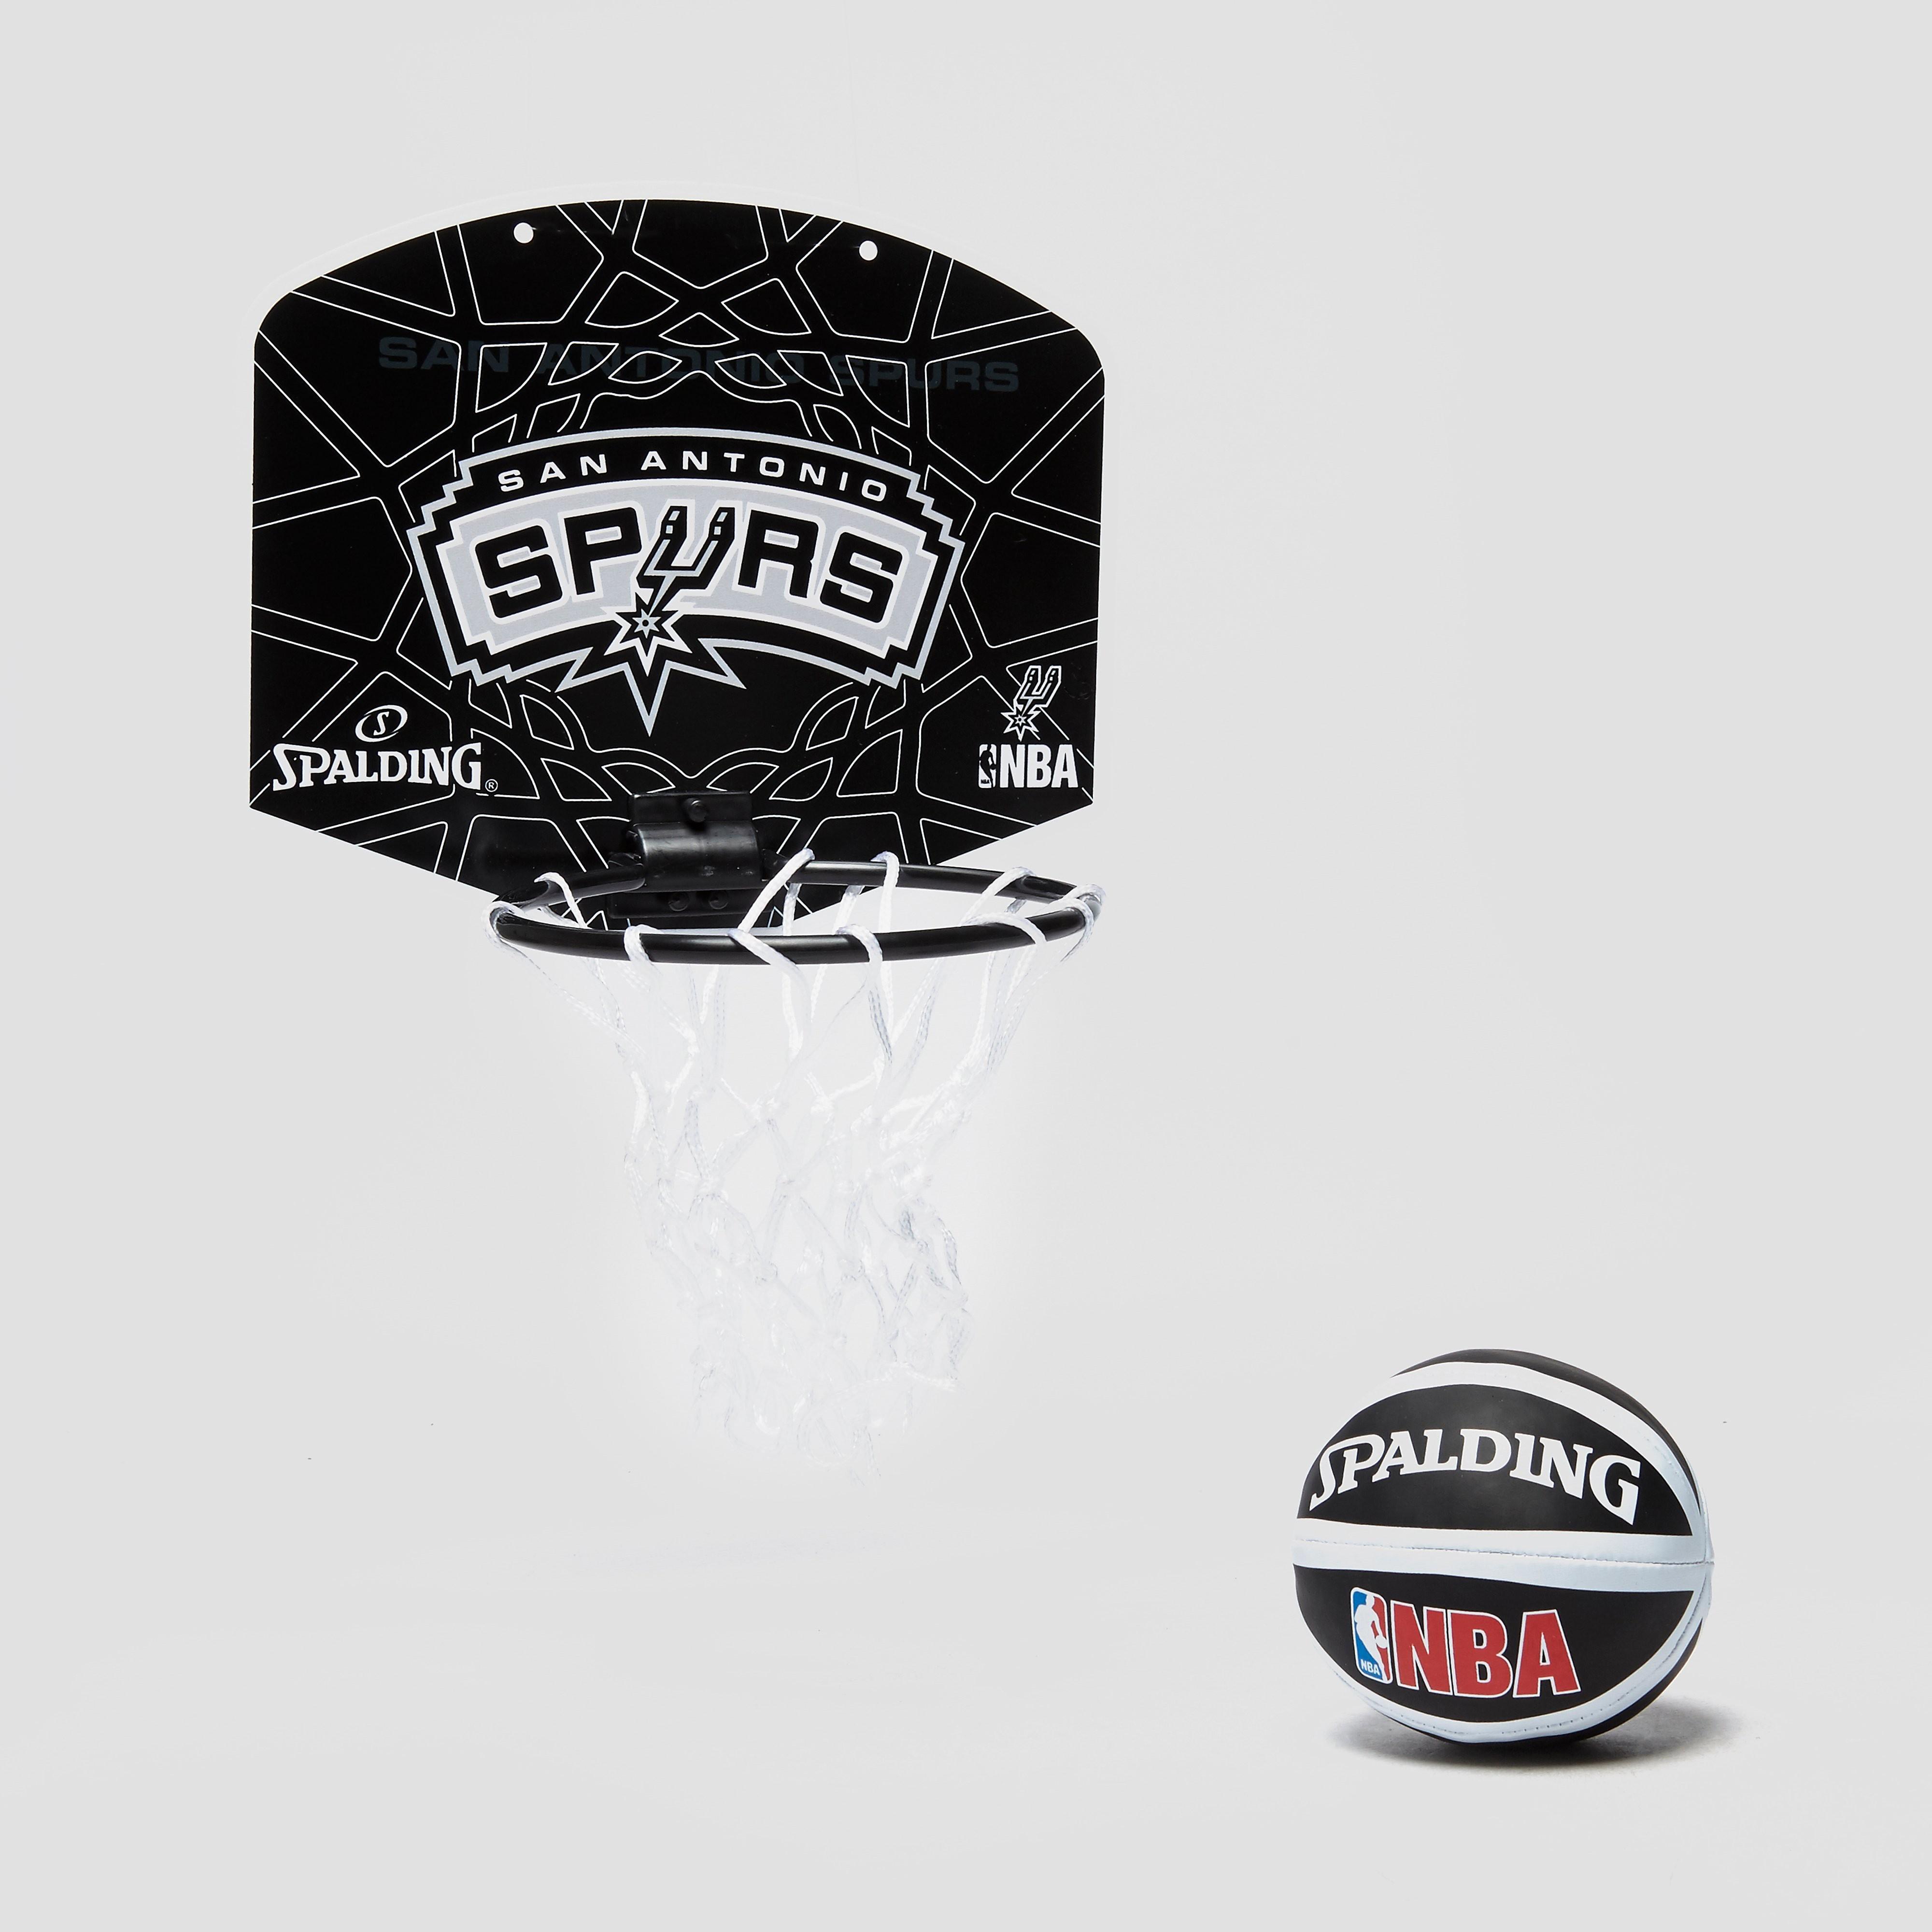 Spalding NBA SA SPurs Miniboard and Mini ball